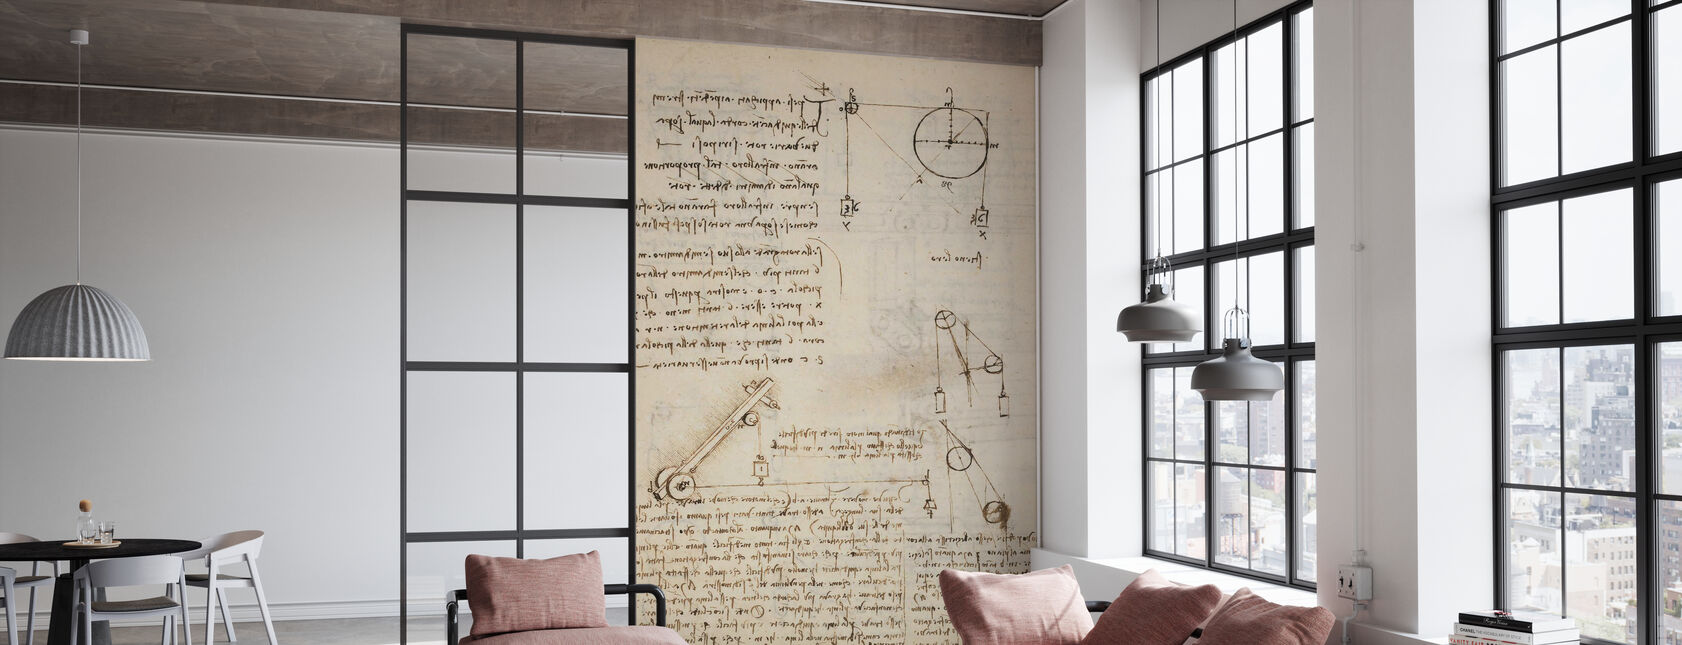 Codex Madrid II - Leonardo da Vinci - Wallpaper - Office